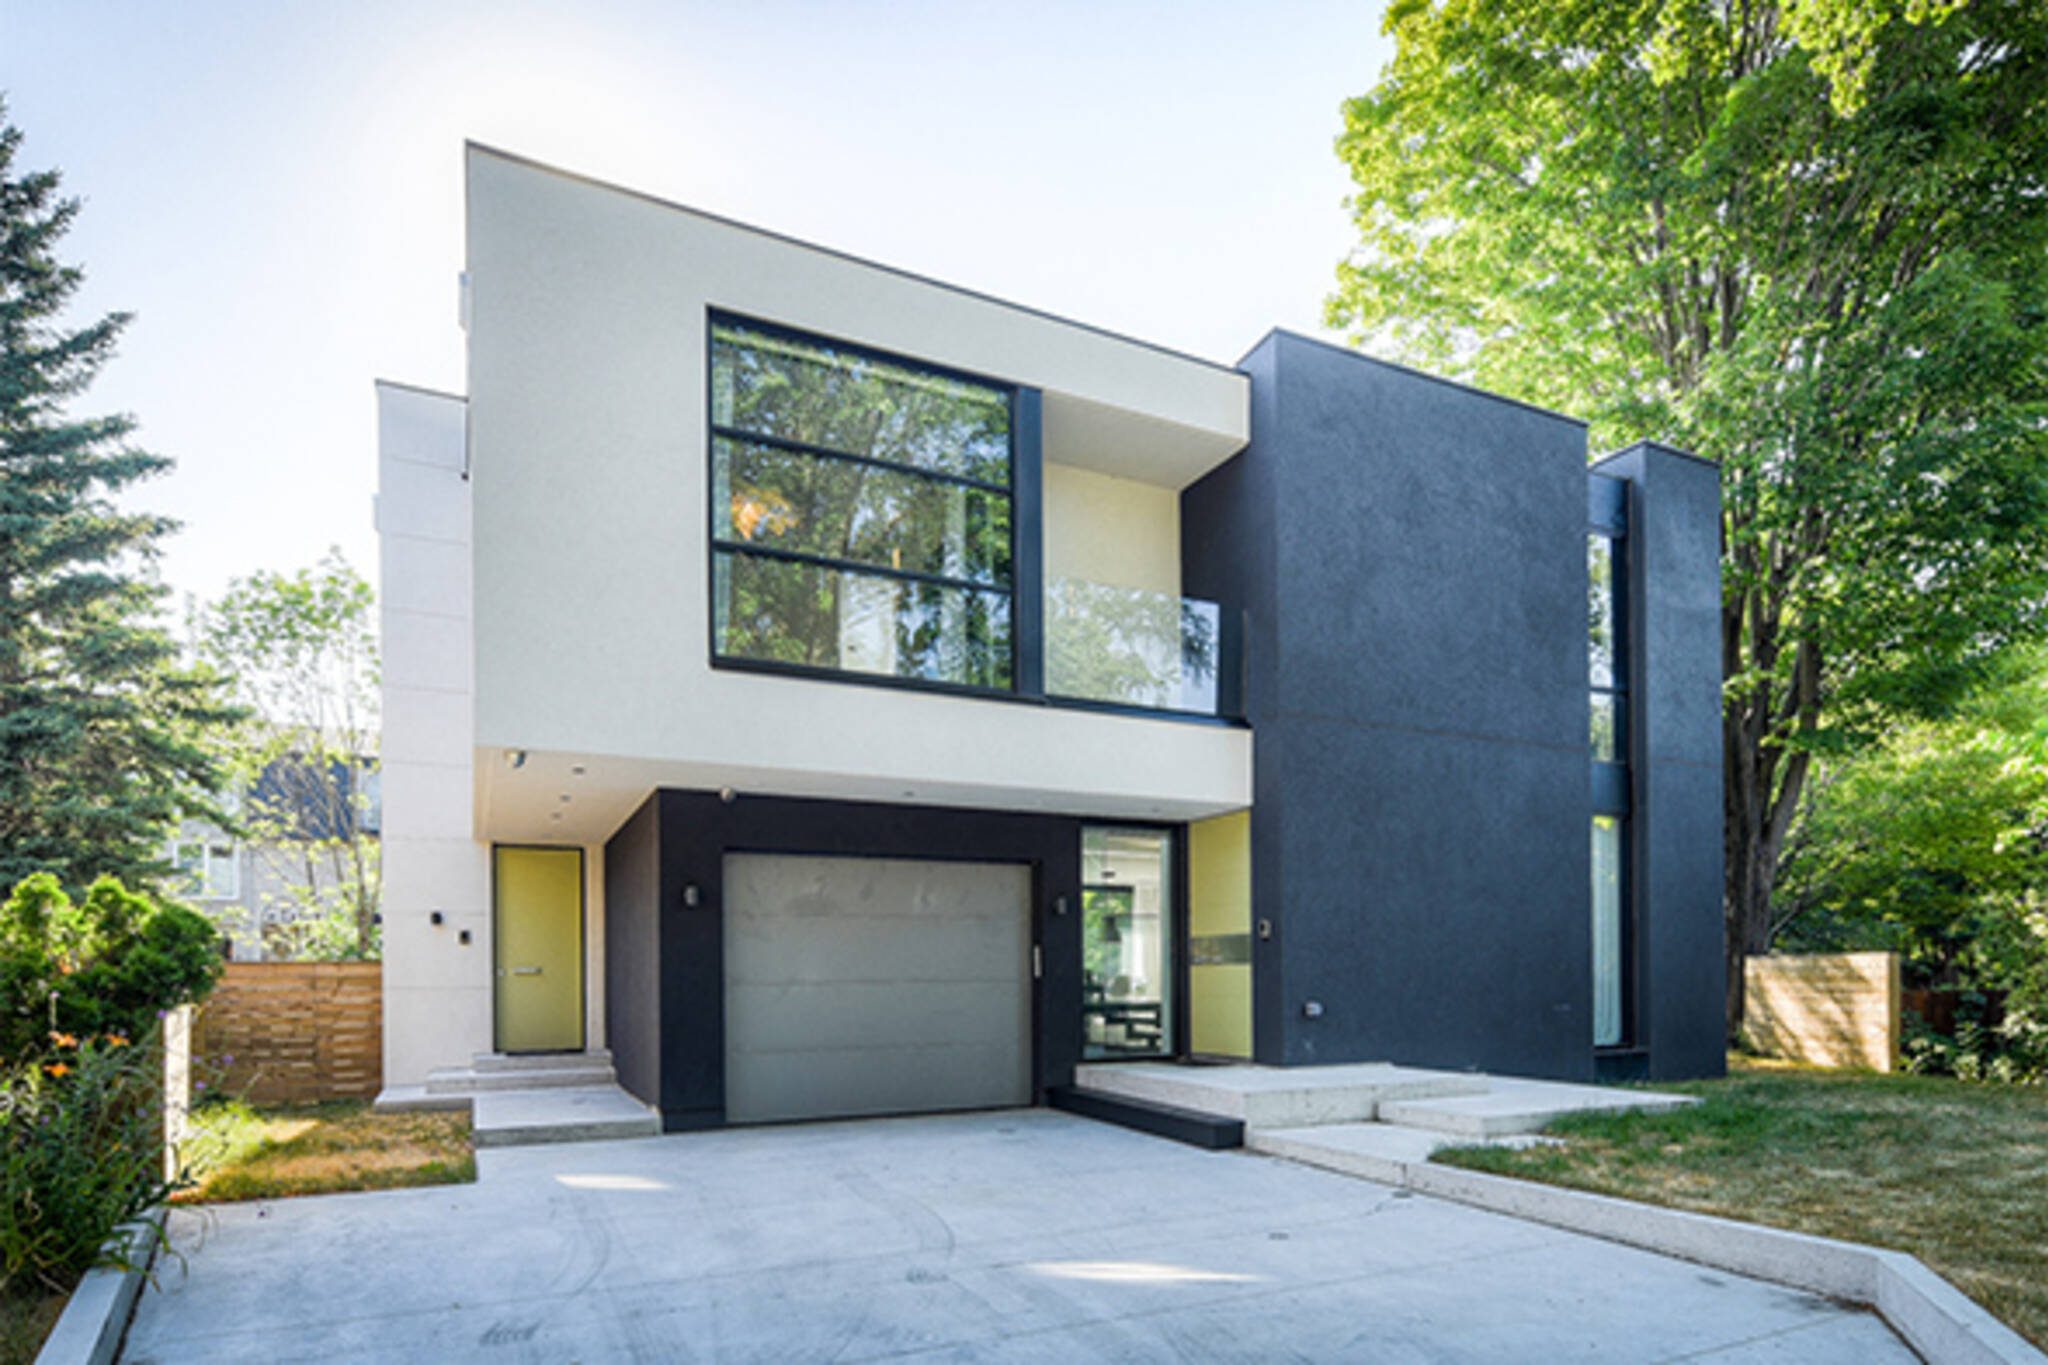 2 million dollar house